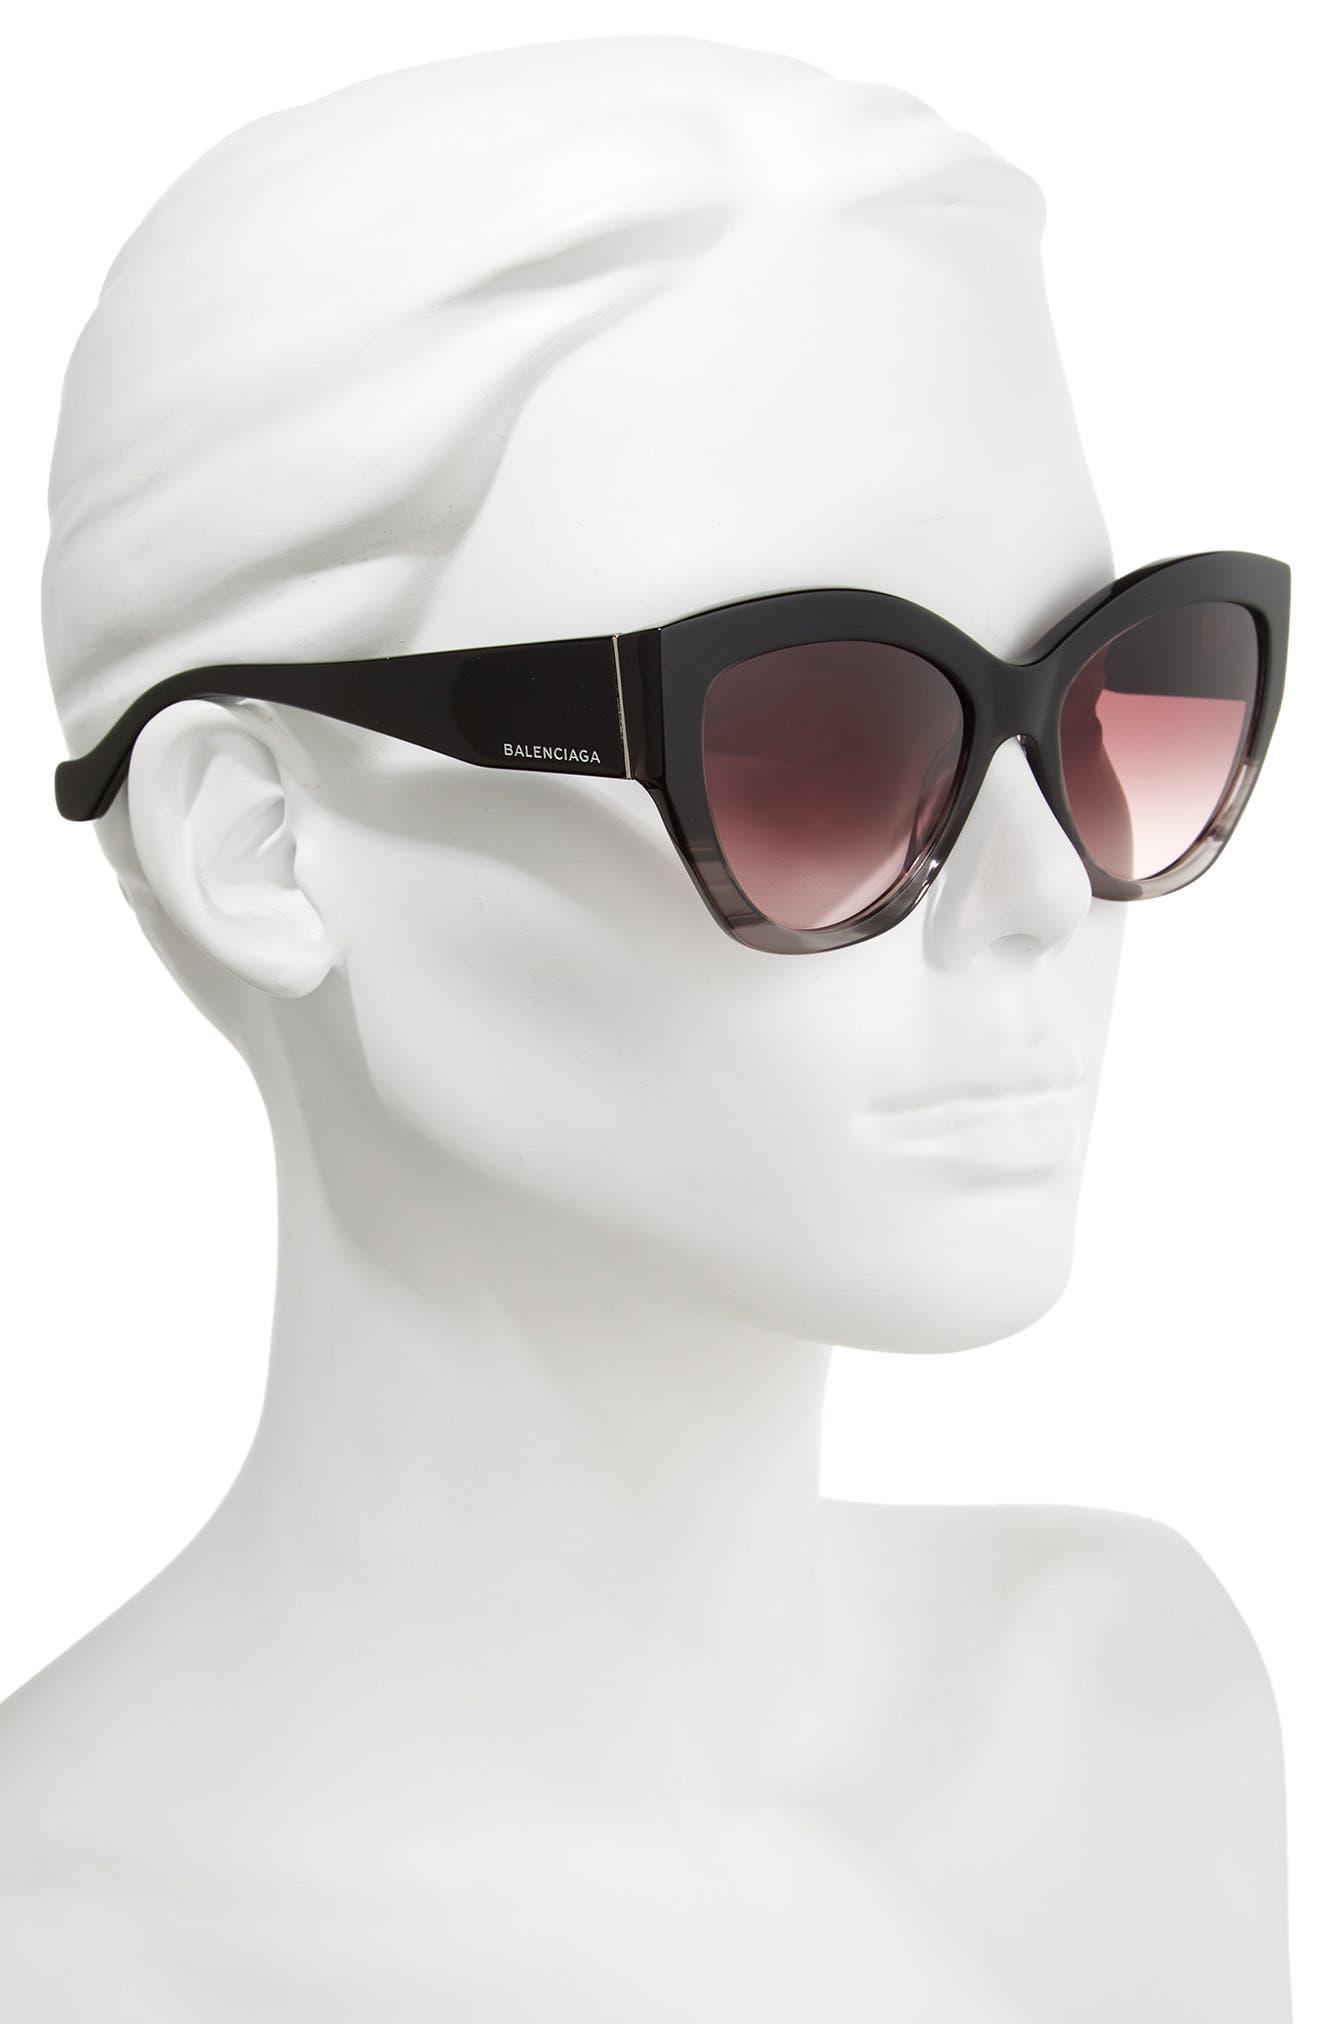 56mm Cat Eye Sunglasses,                             Alternate thumbnail 2, color,                             001